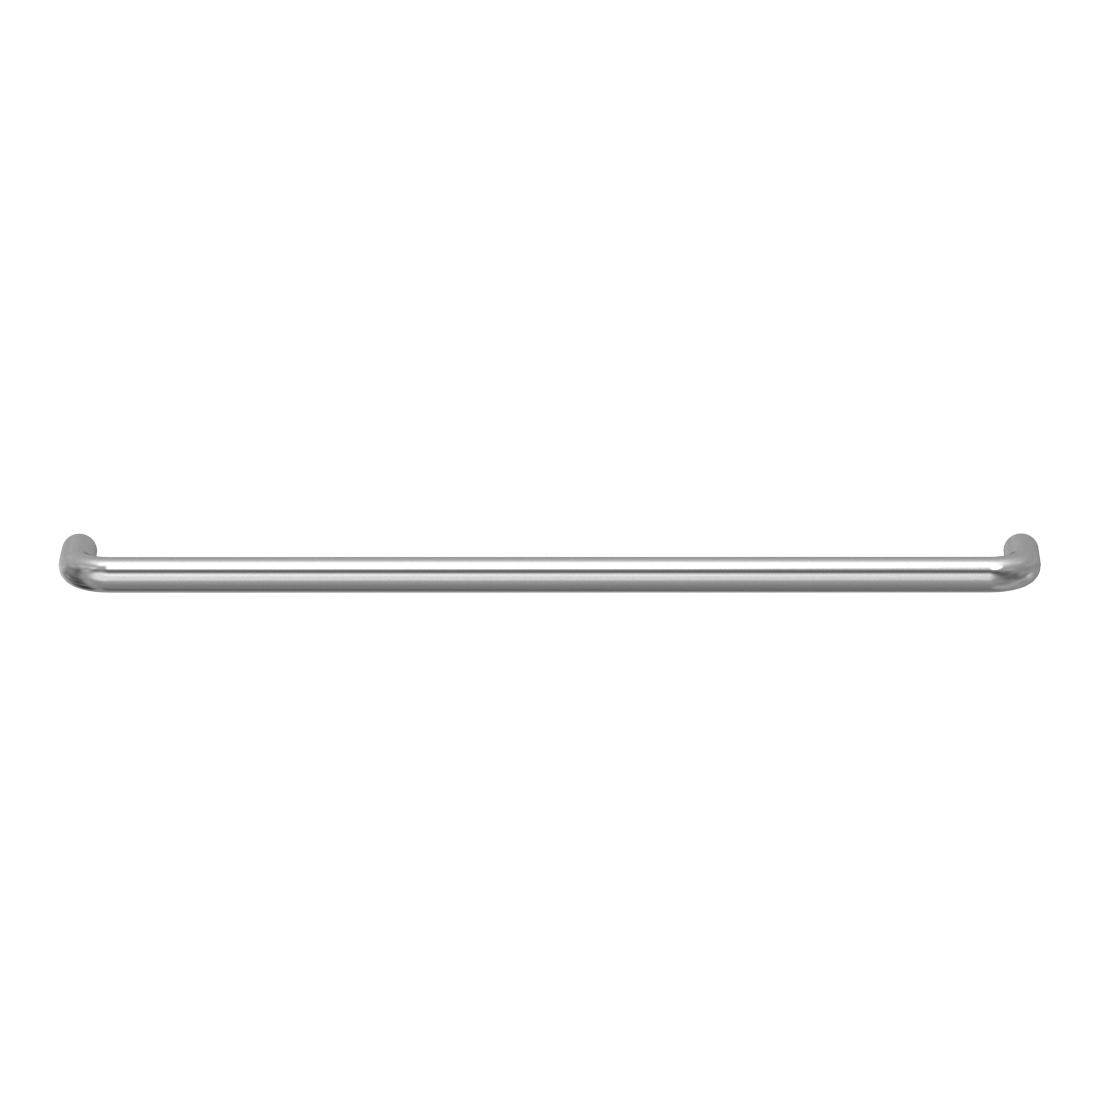 Standard Push Bars